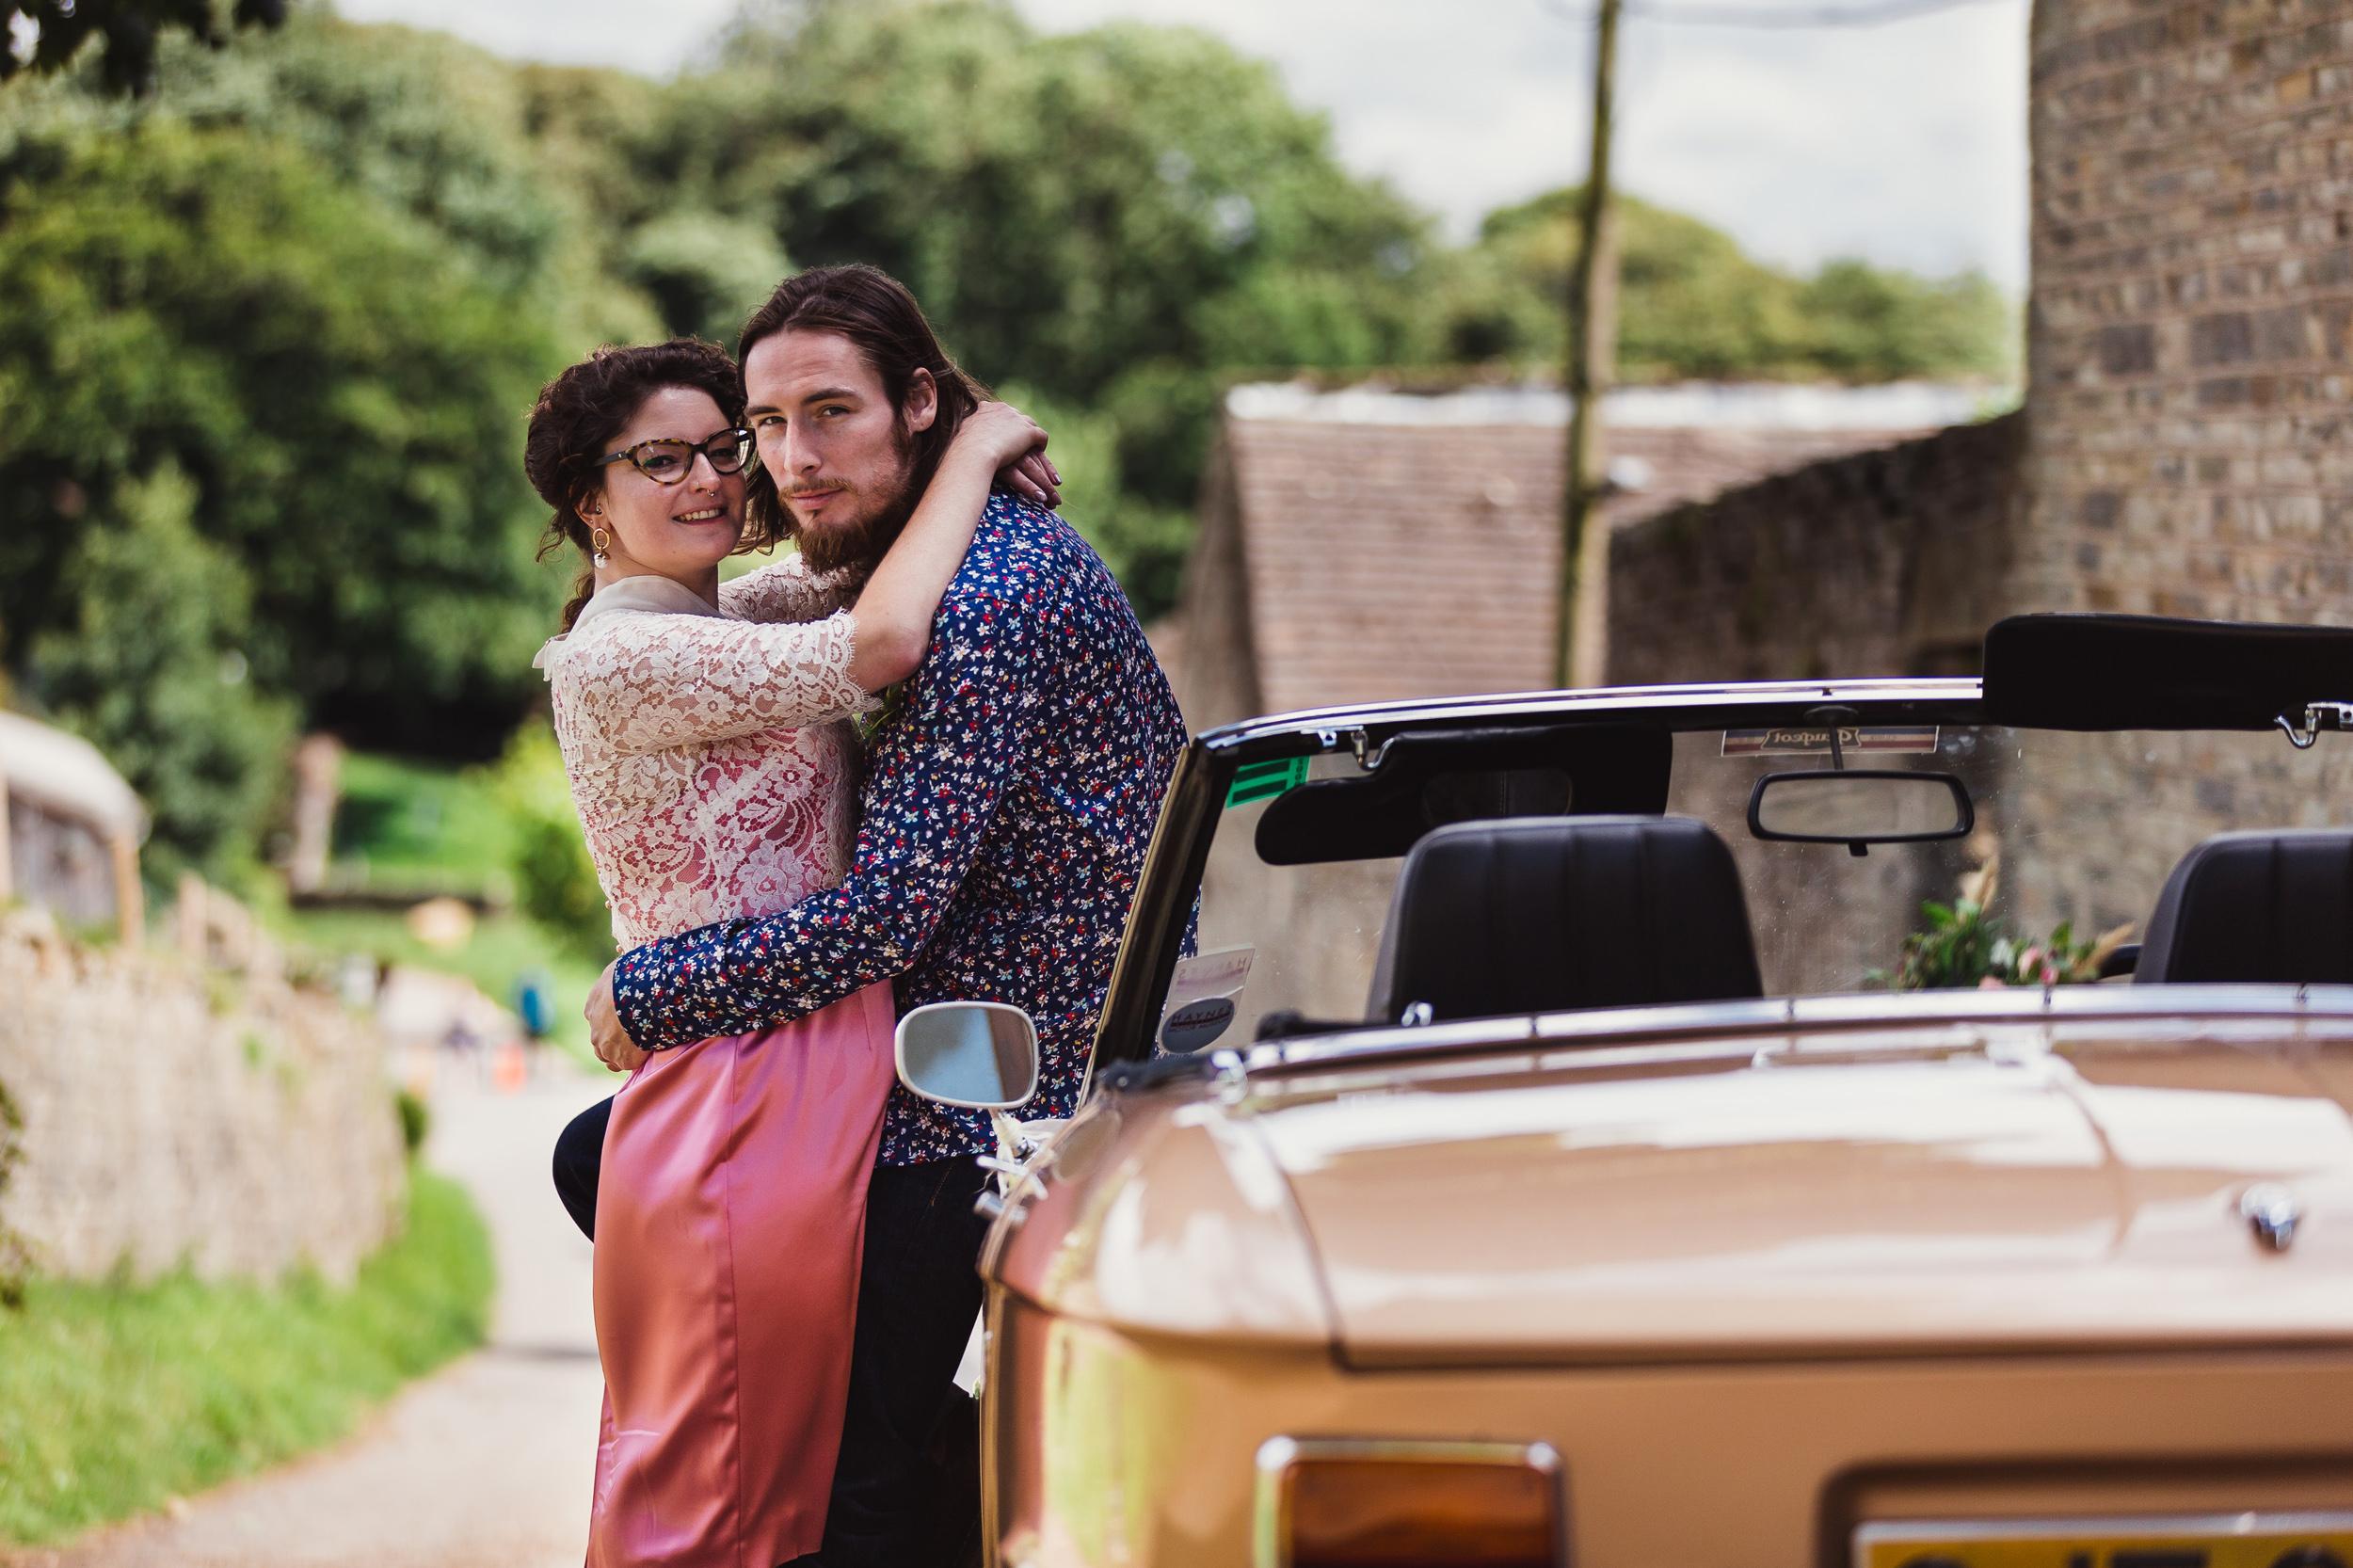 Emma-Coloured-Wedding-Dress-Sheffield-Kate-Beaumont-19.jpg